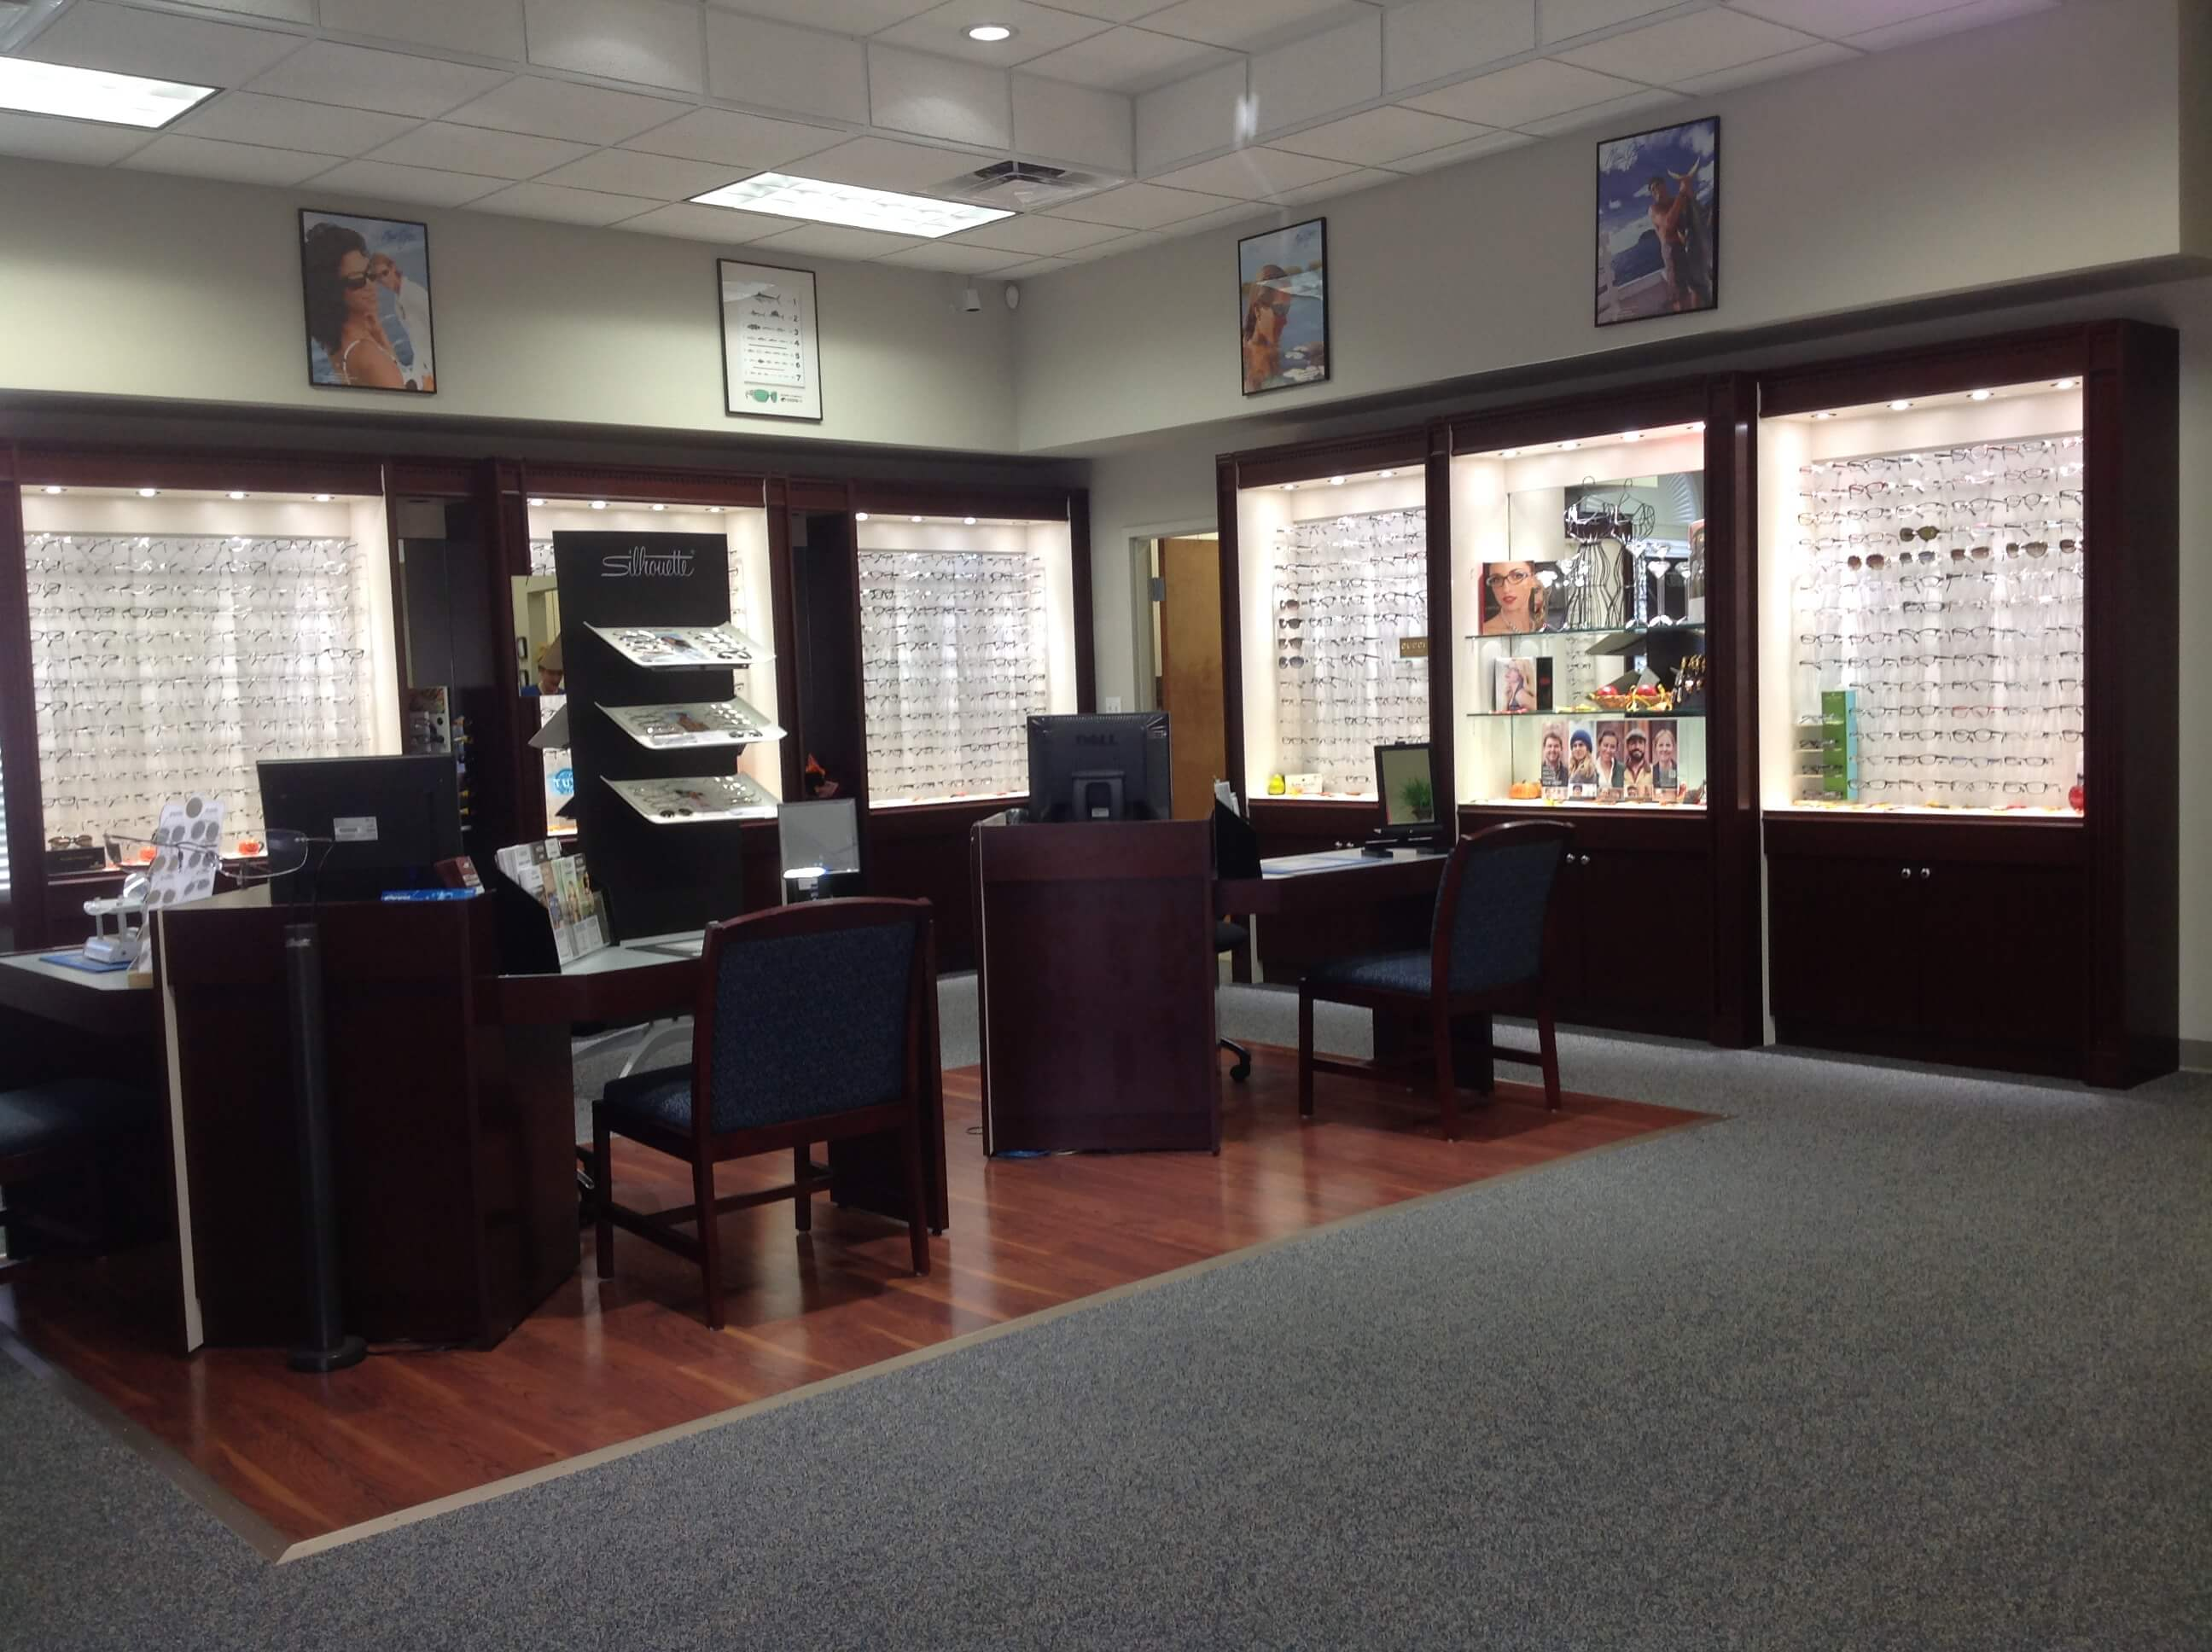 Optometrist, Rockledge high school, FL